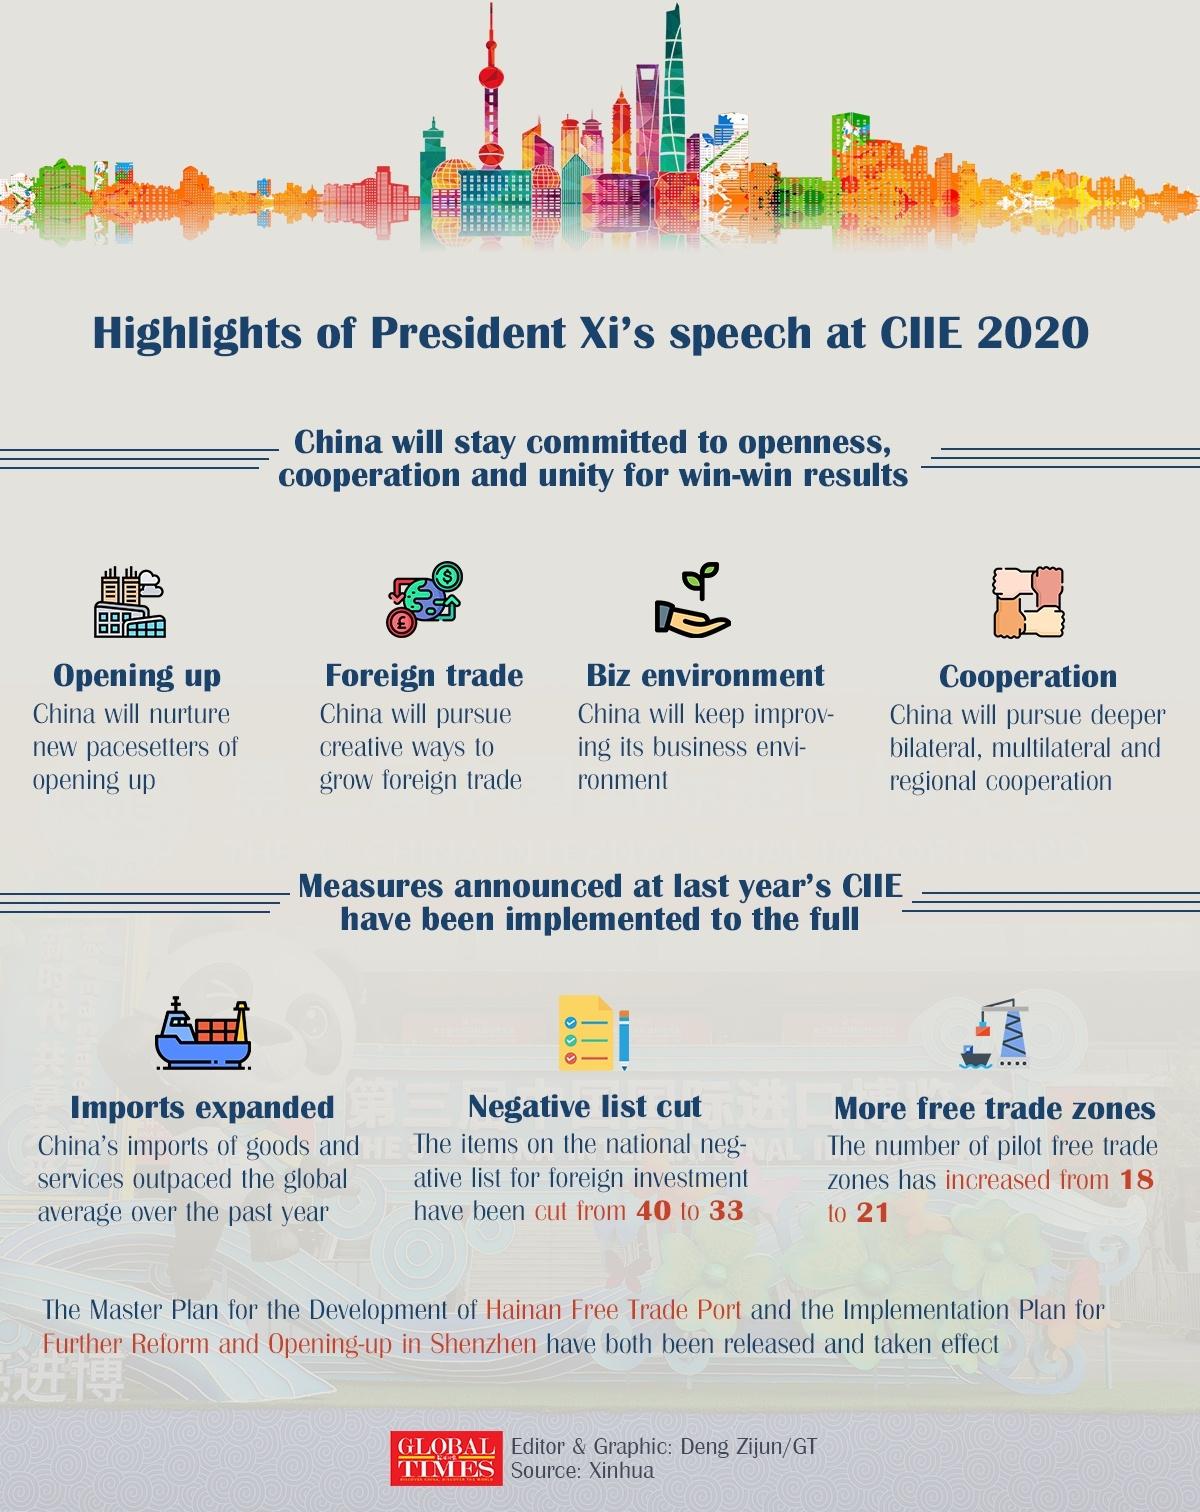 Highlights of President Xi's speech at CIIE 2020